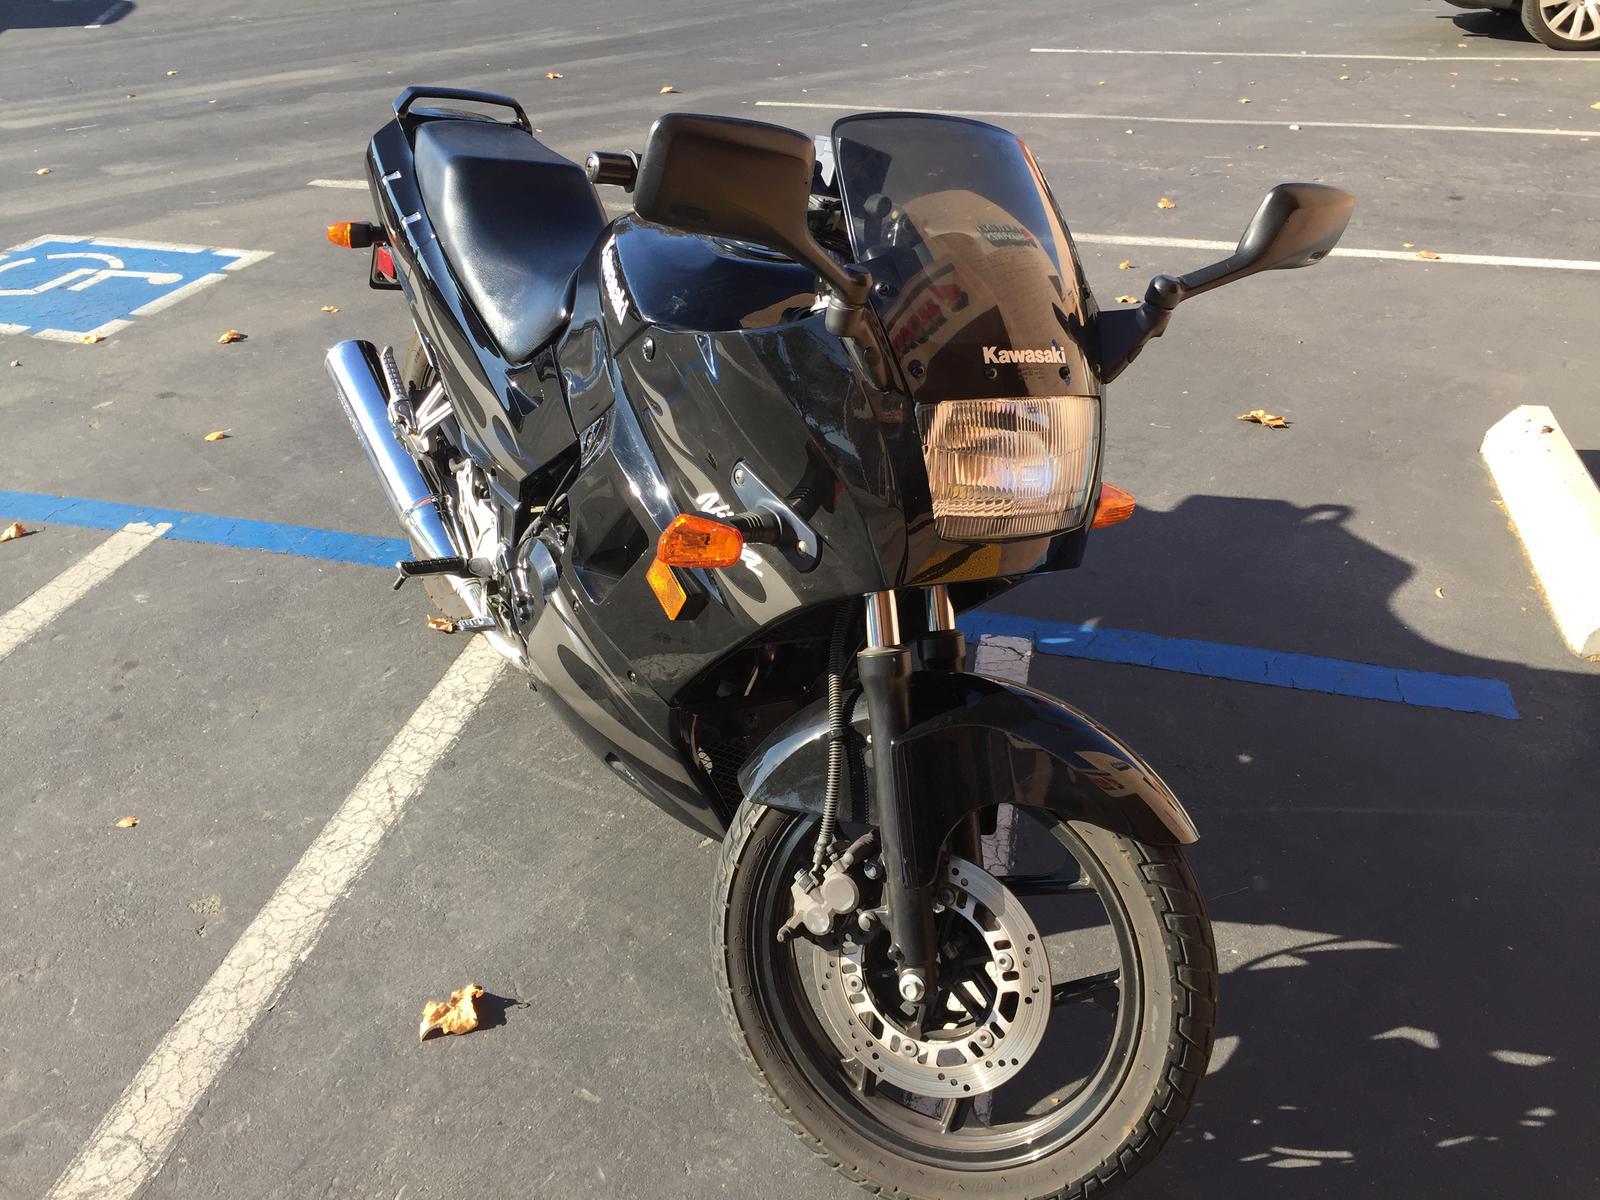 $2,999, 2006 Kawasaki NINJA 250R